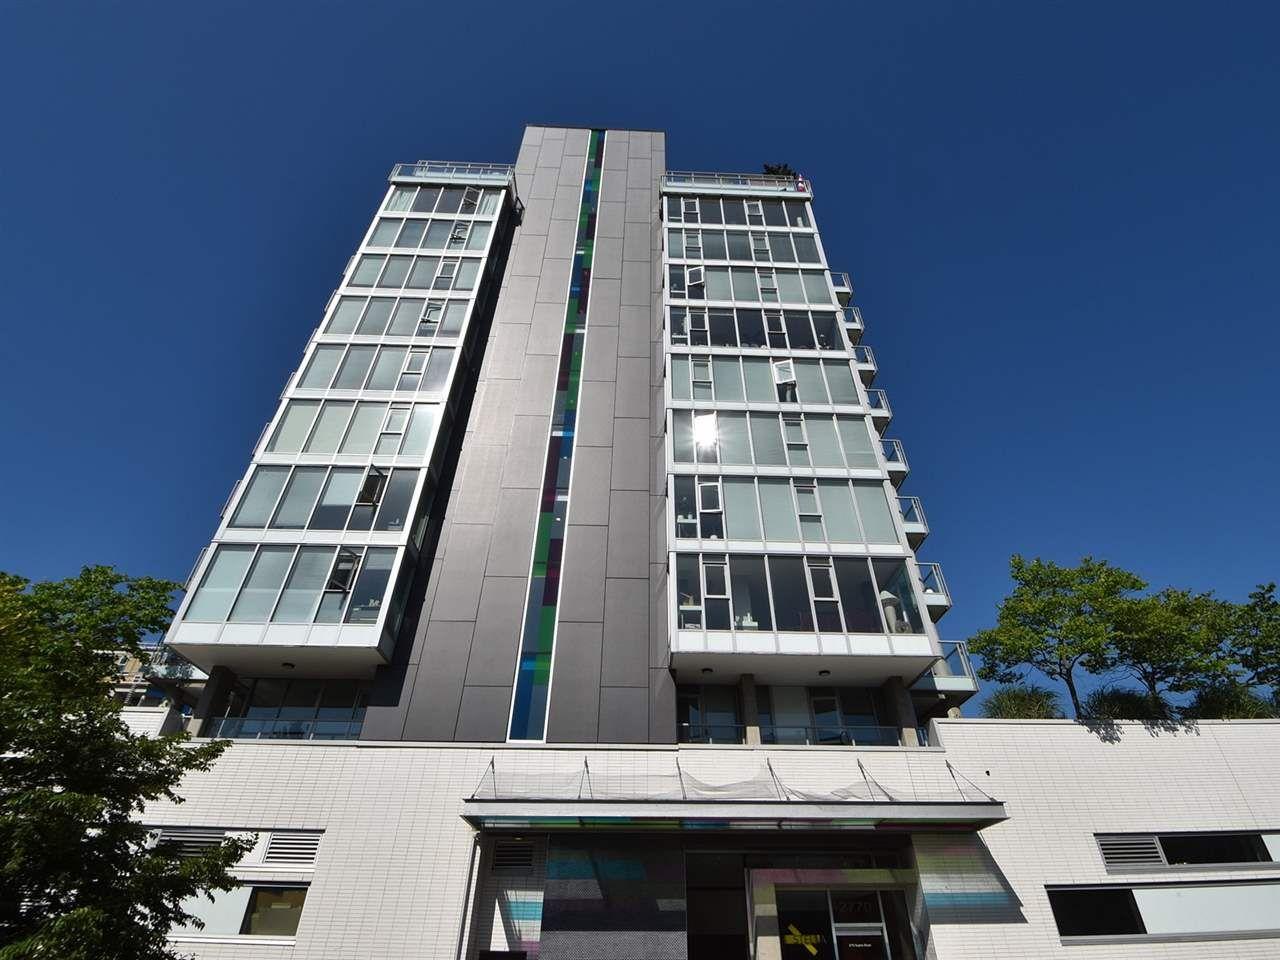 "Main Photo: 502 2770 SOPHIA Street in Vancouver: Mount Pleasant VE Condo for sale in ""STELLA"" (Vancouver East)  : MLS®# R2184173"